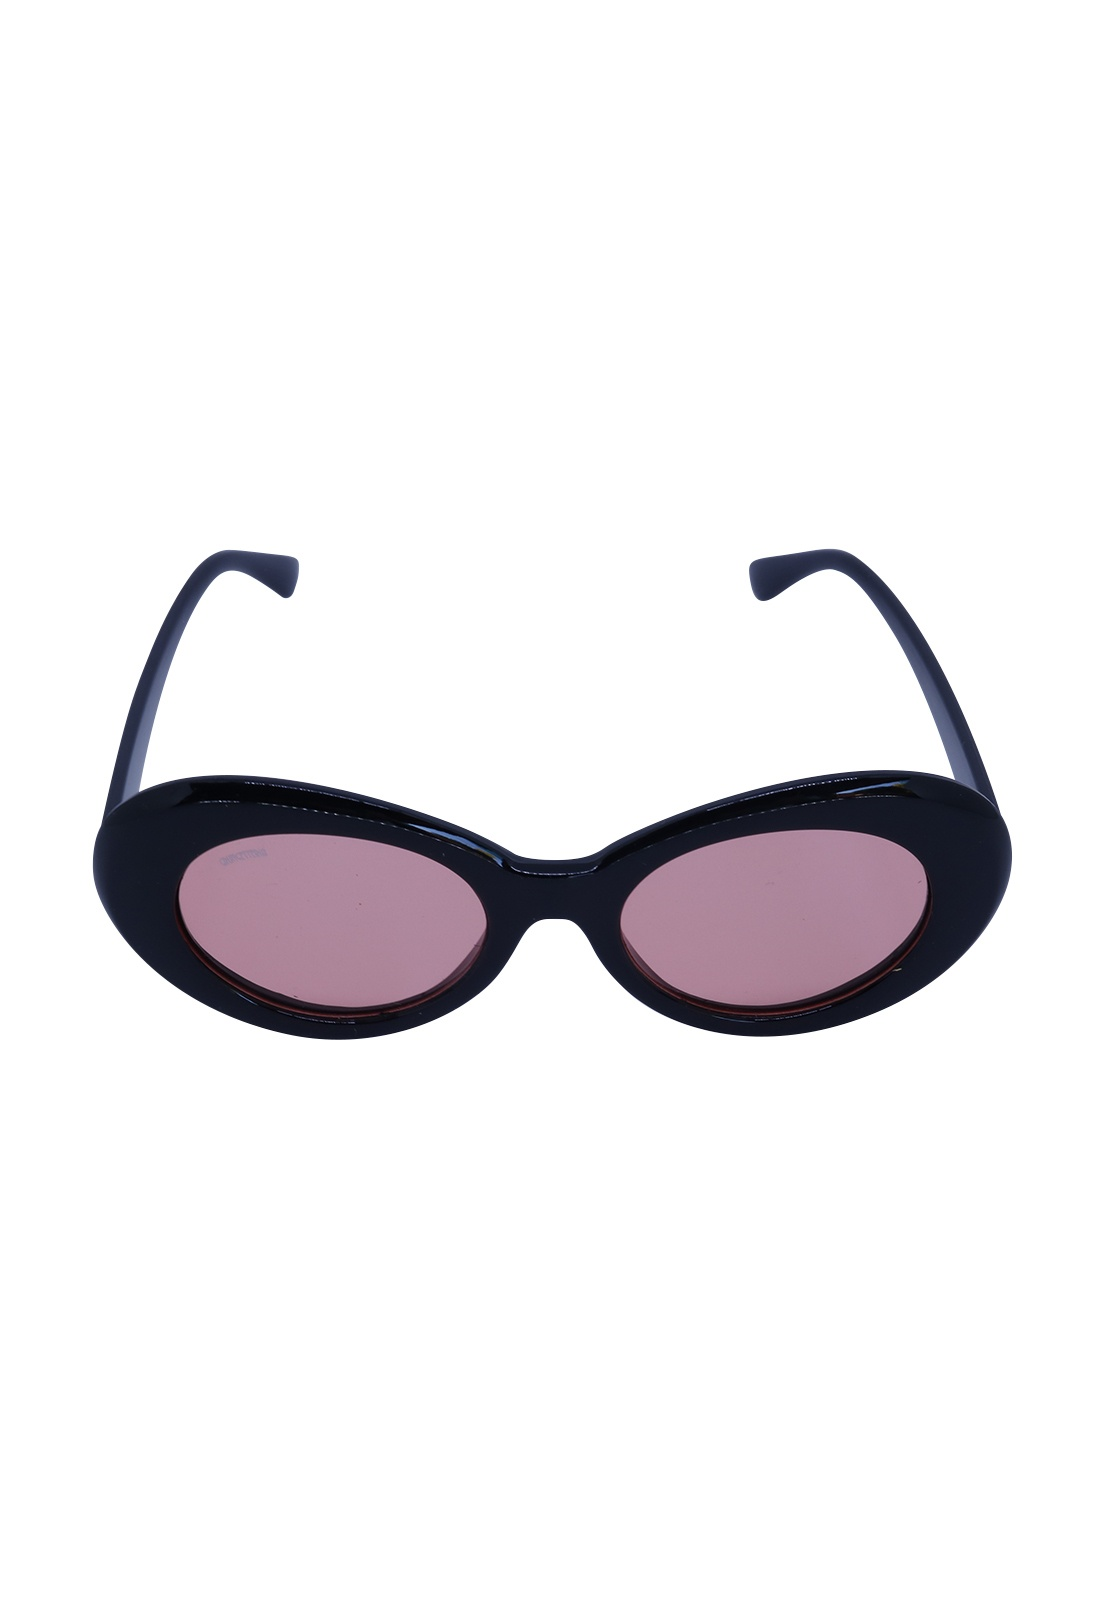 Óculos de Sol Grungetteria Kurt Tokyo